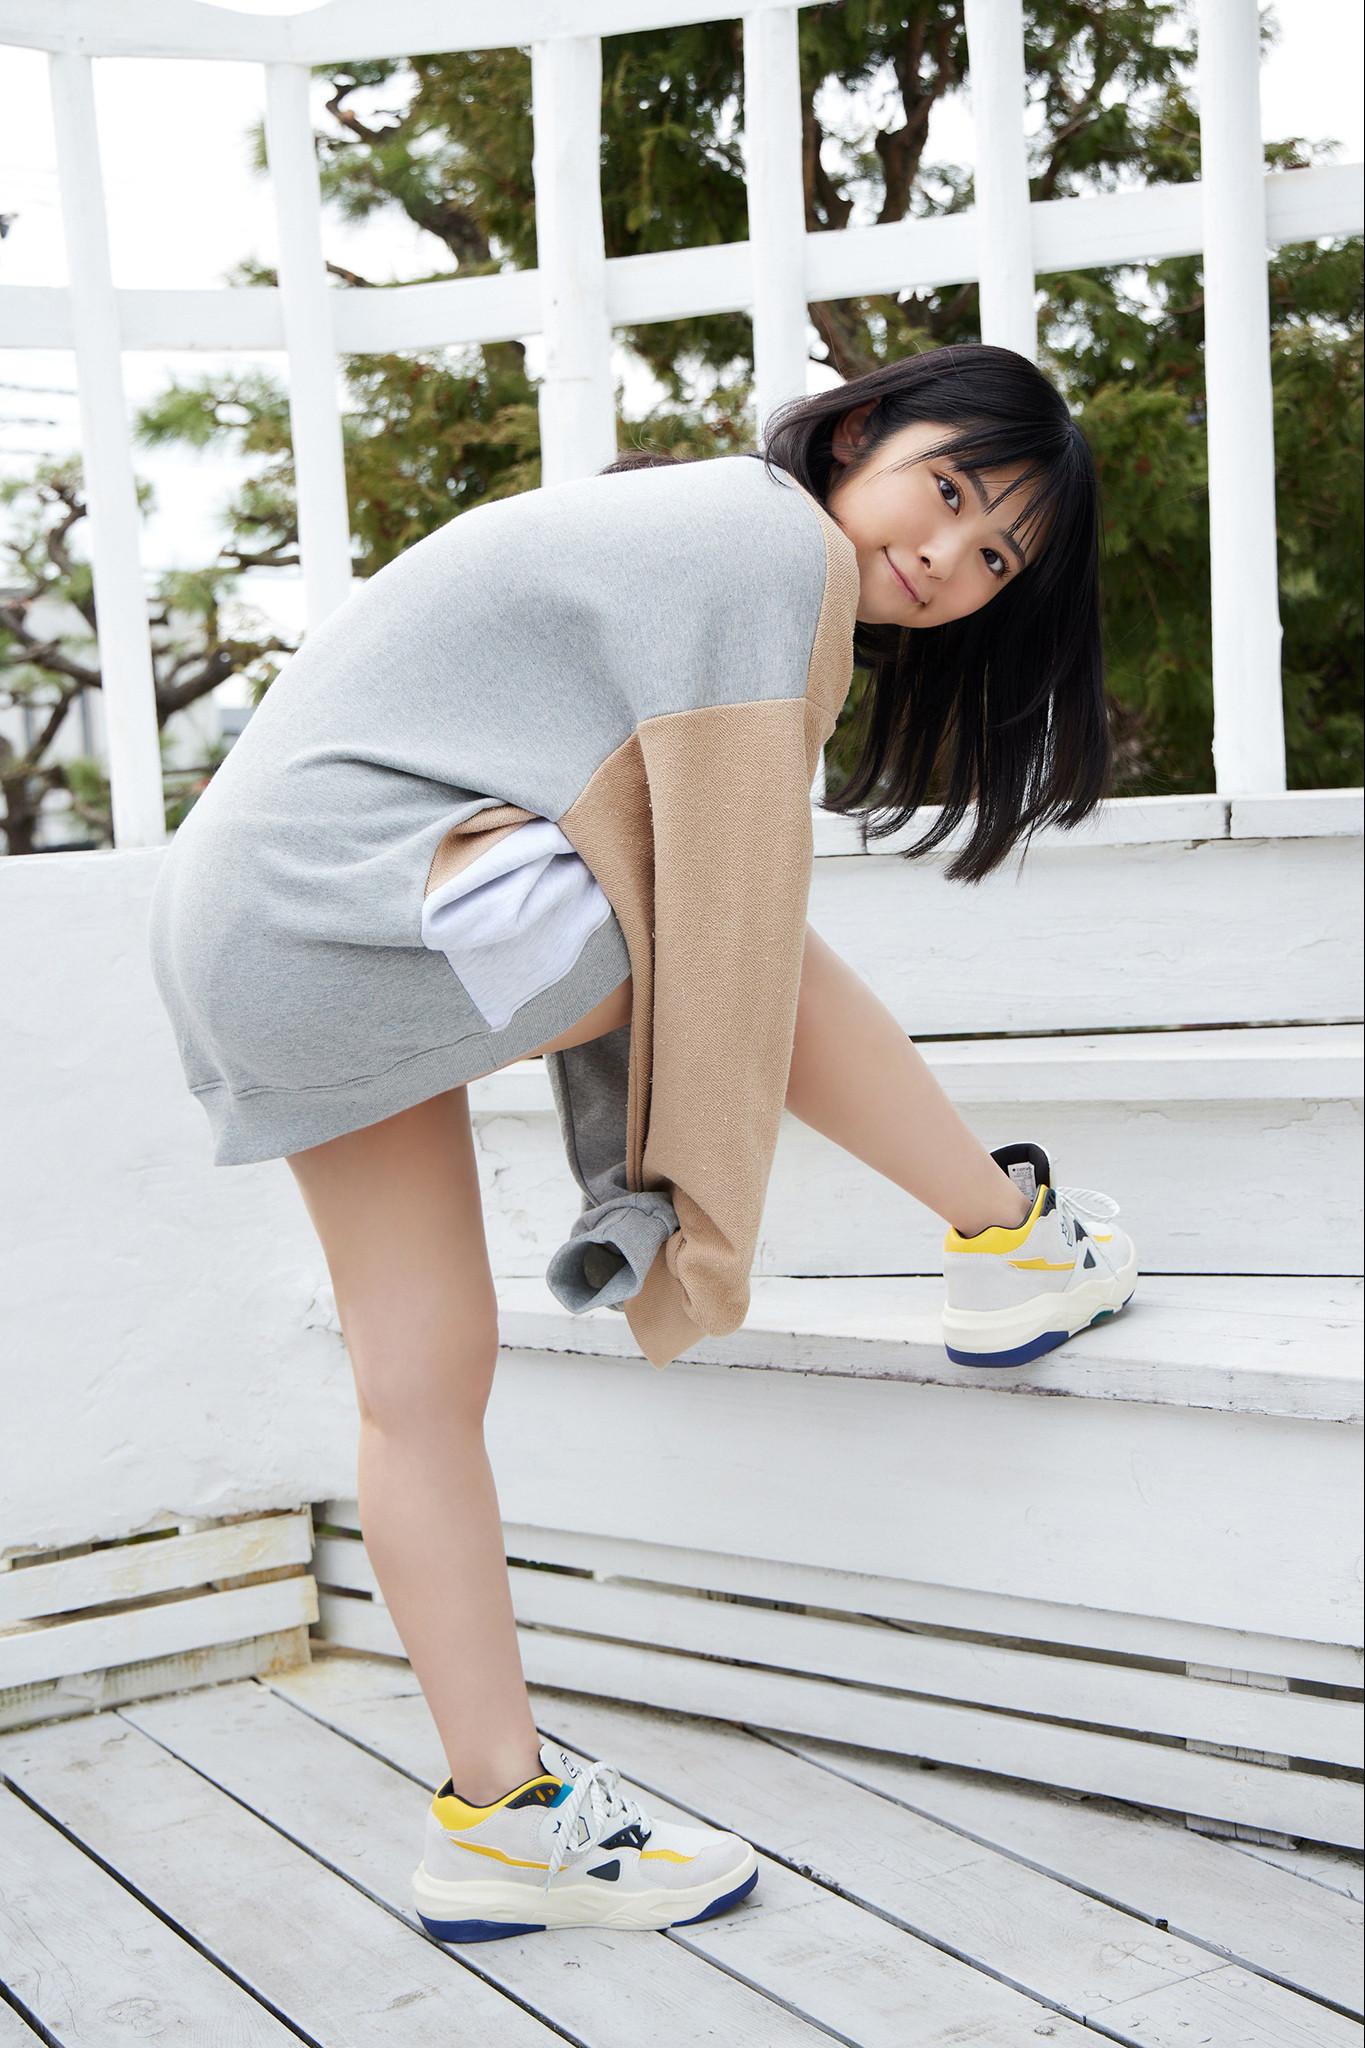 [Yanmaga Web] 岡田彩夢・ヤンマガアザーっす!12